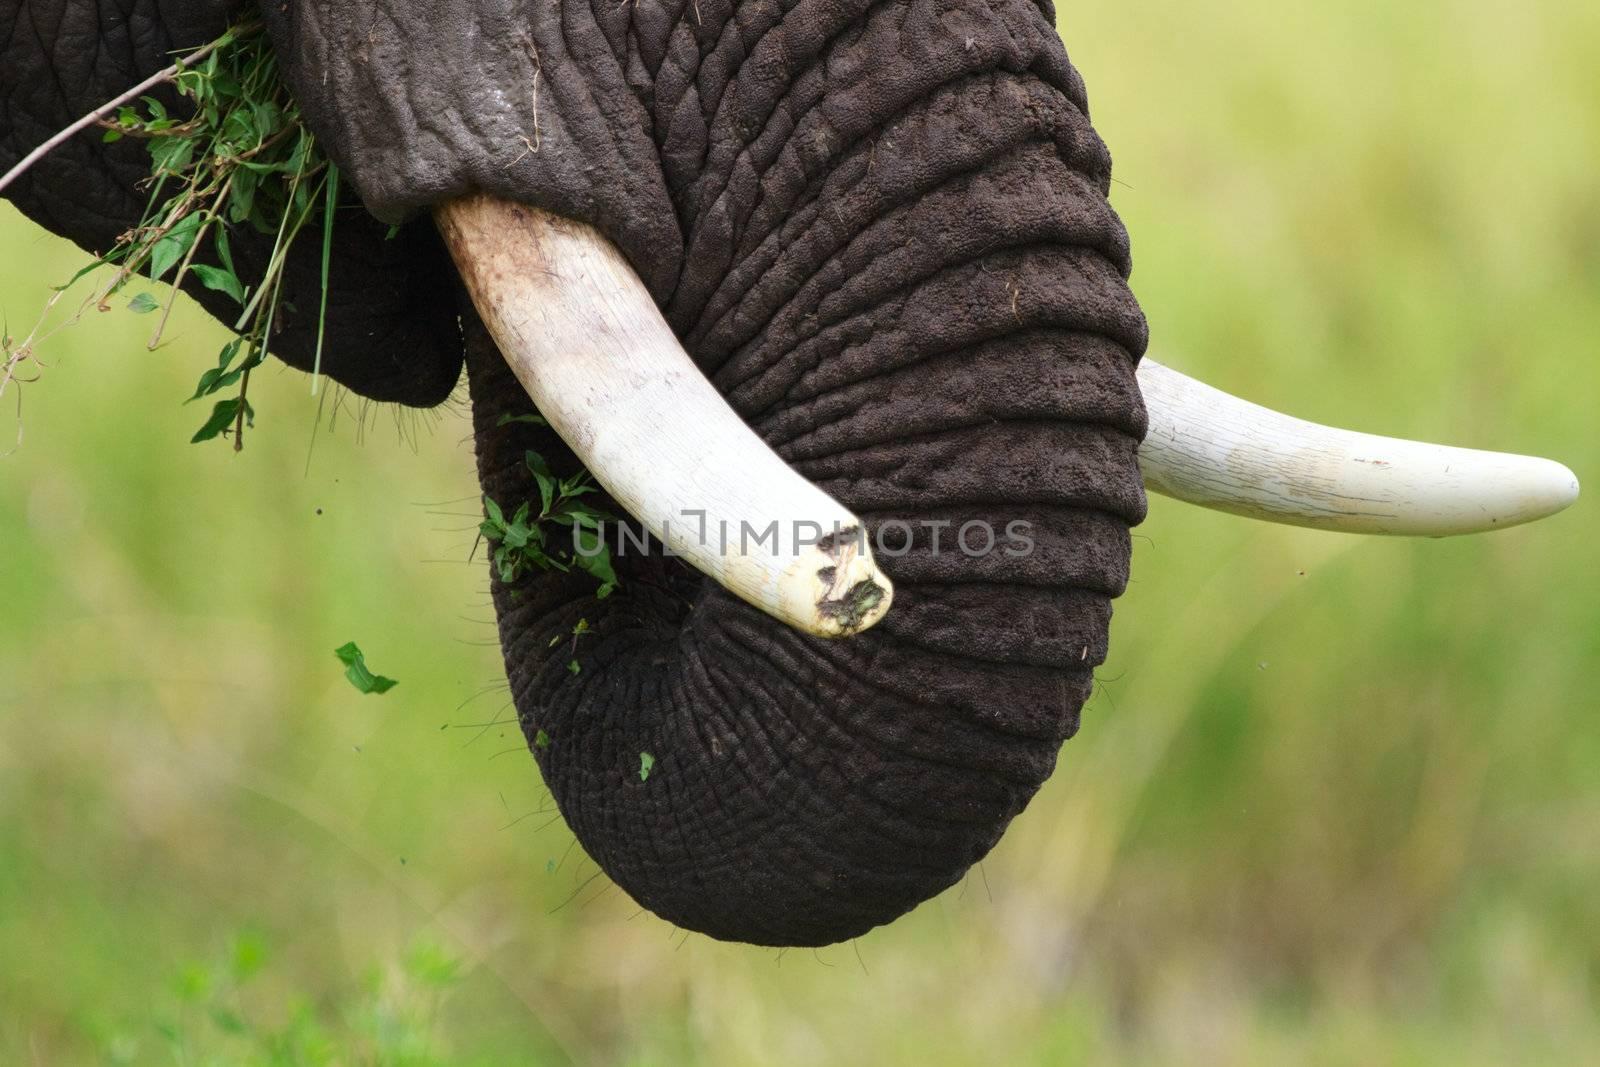 Closeup of male elephant with broken tusk. Serengeti national park, Tanzania